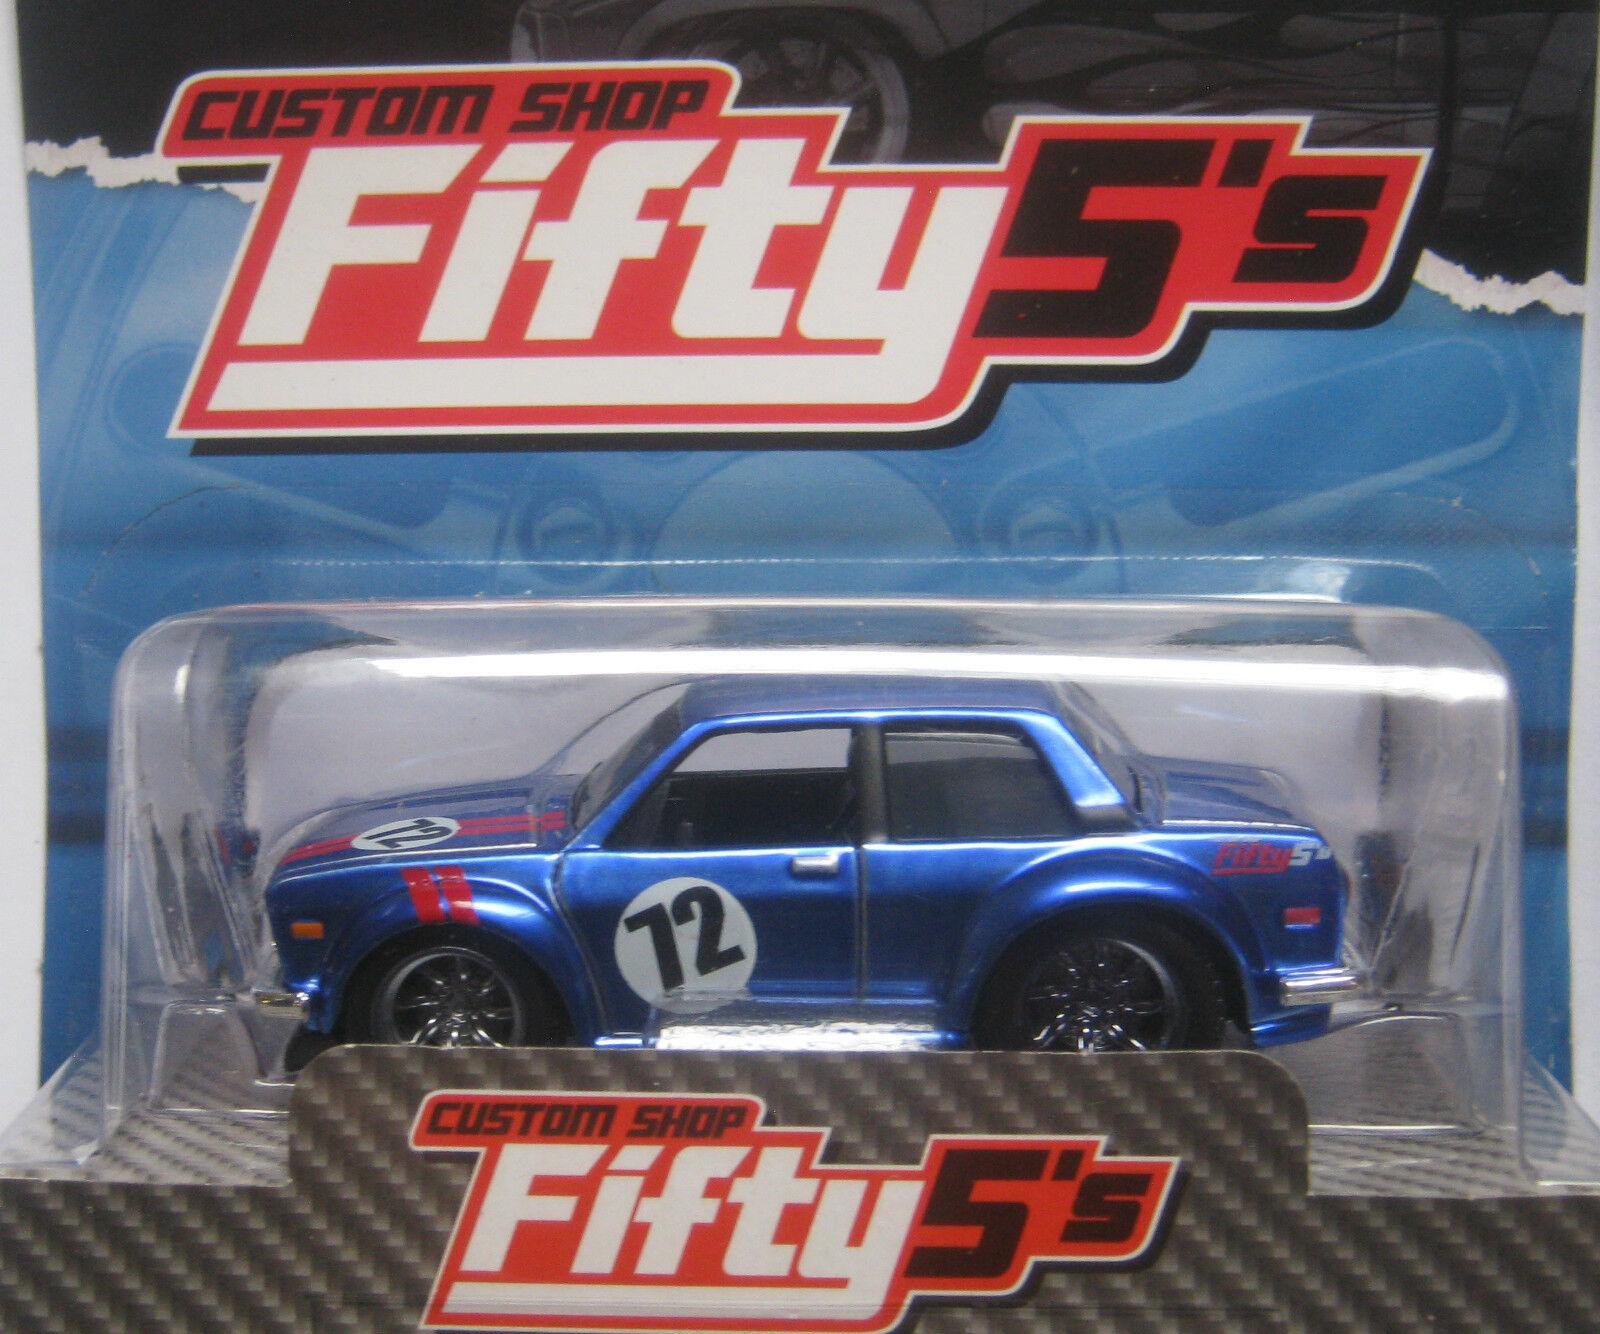 Maisto Datsun 1972 Datsun 510 bluee .... 8.5cm long